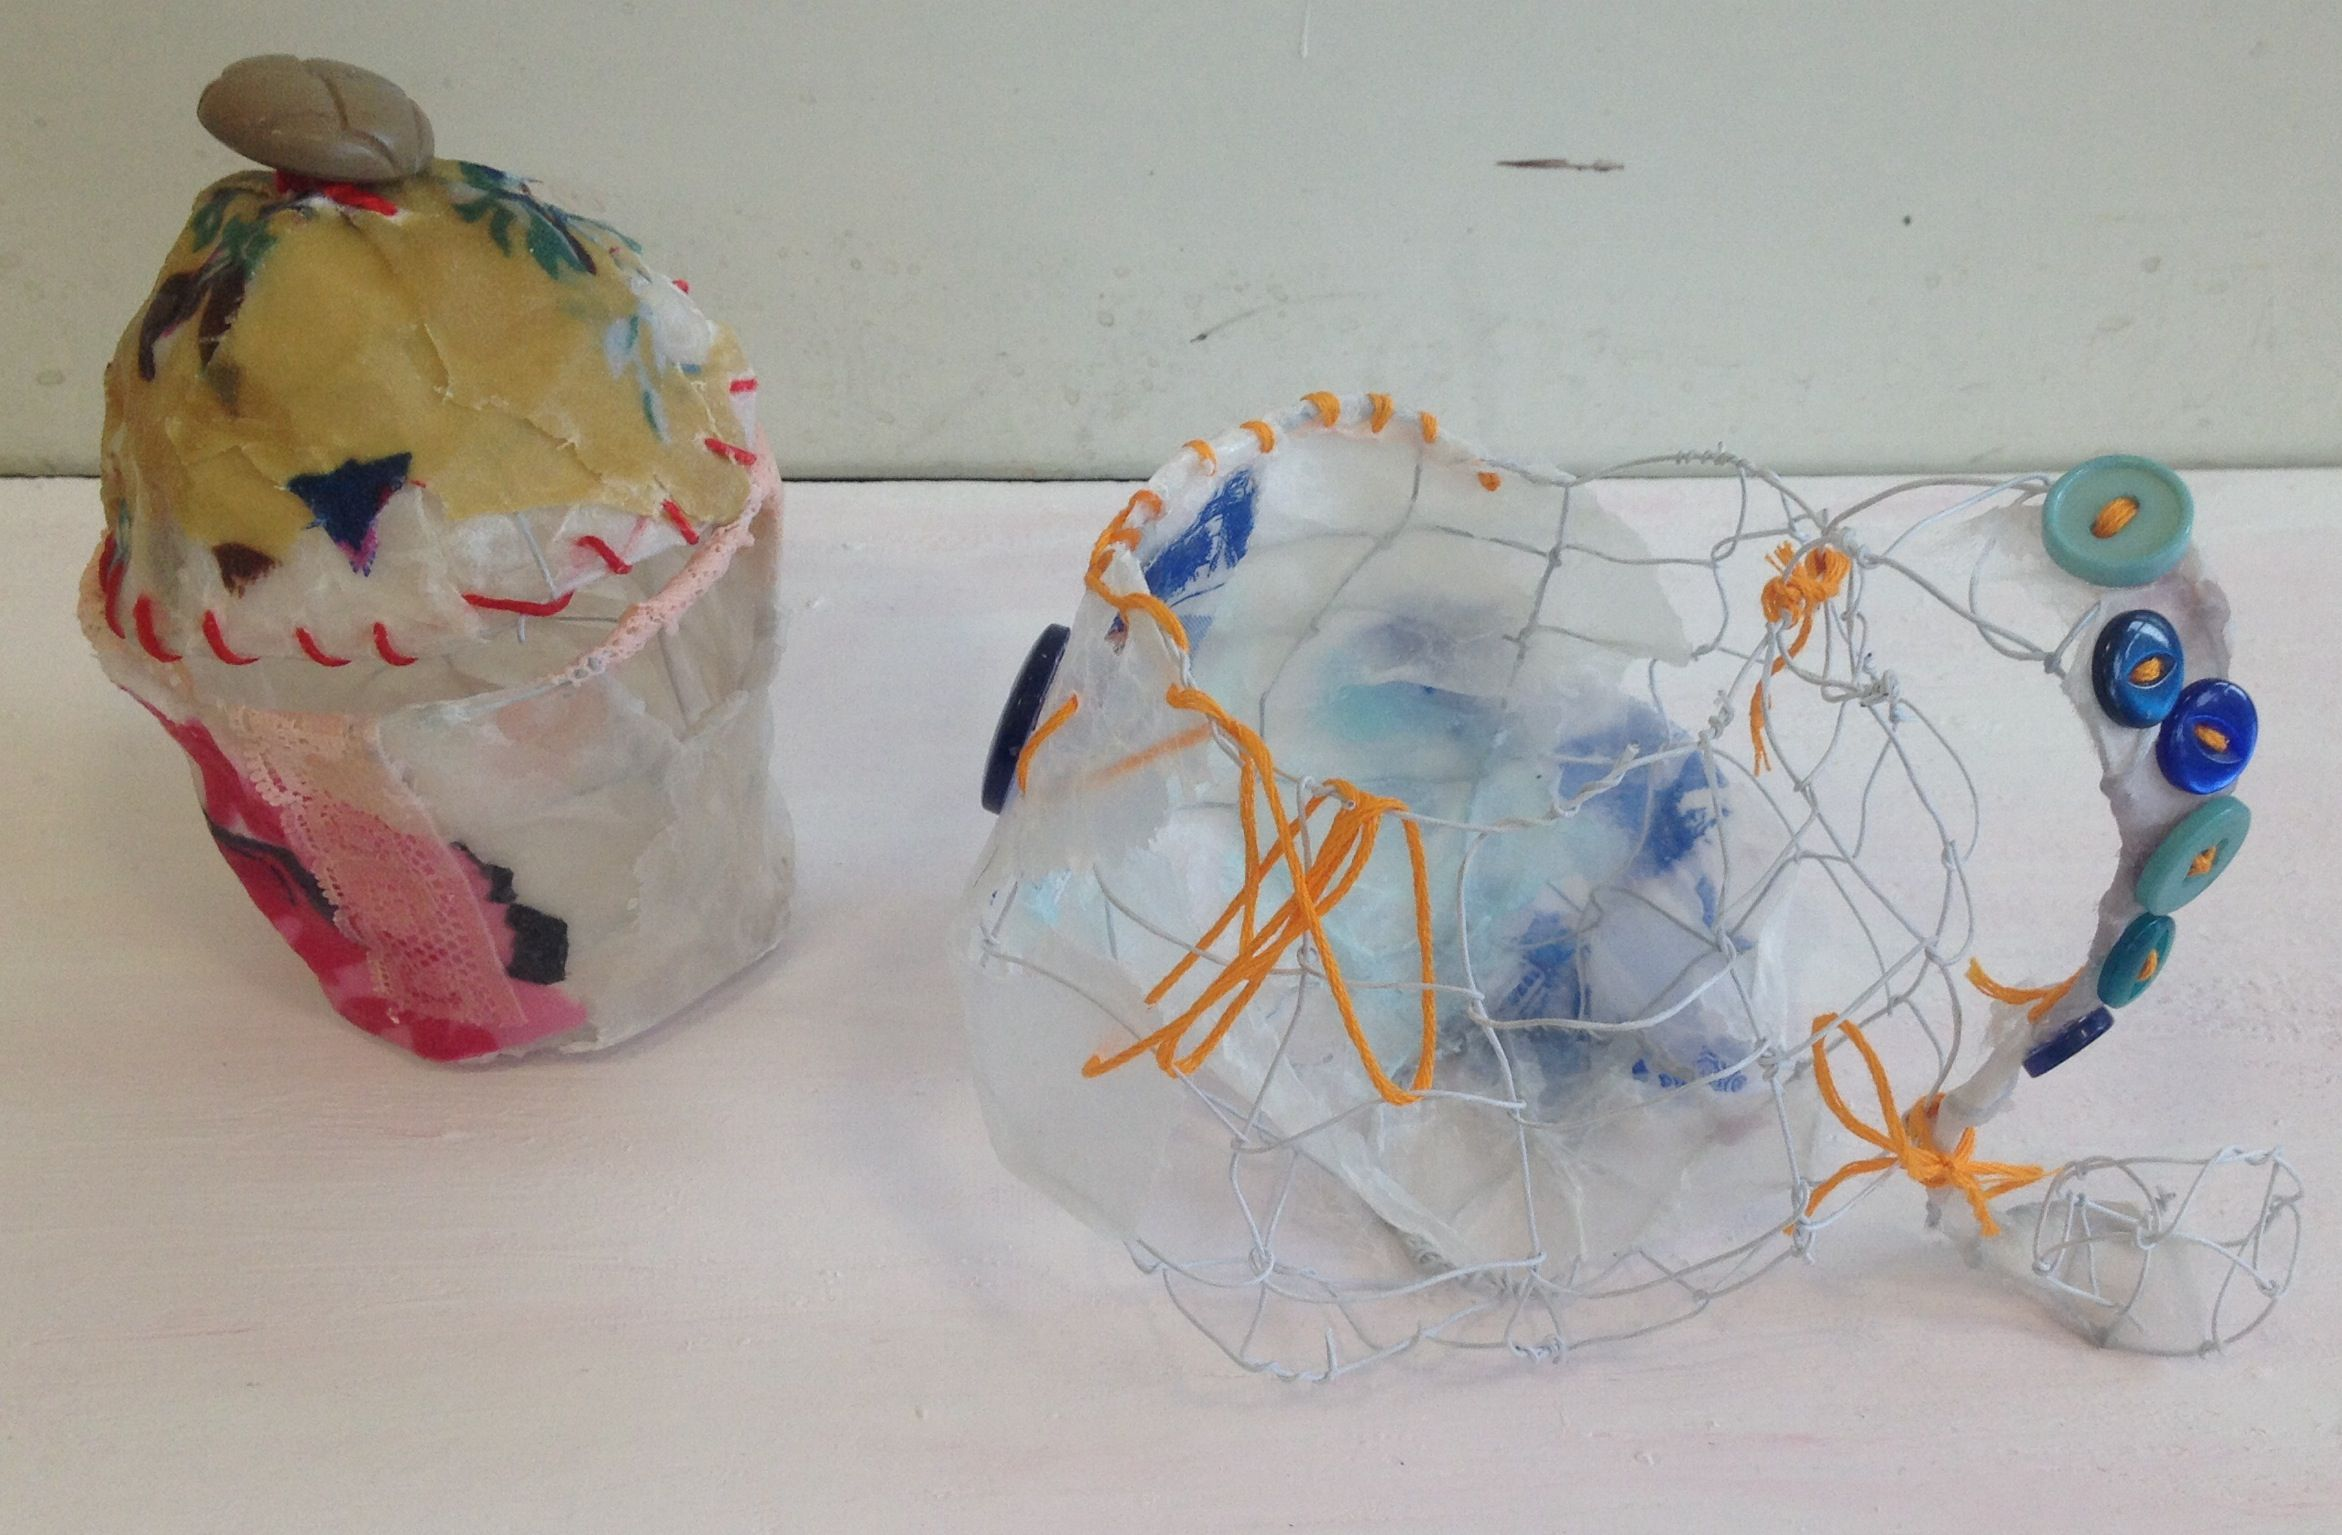 Artwork produced during Priscilla jones workshop